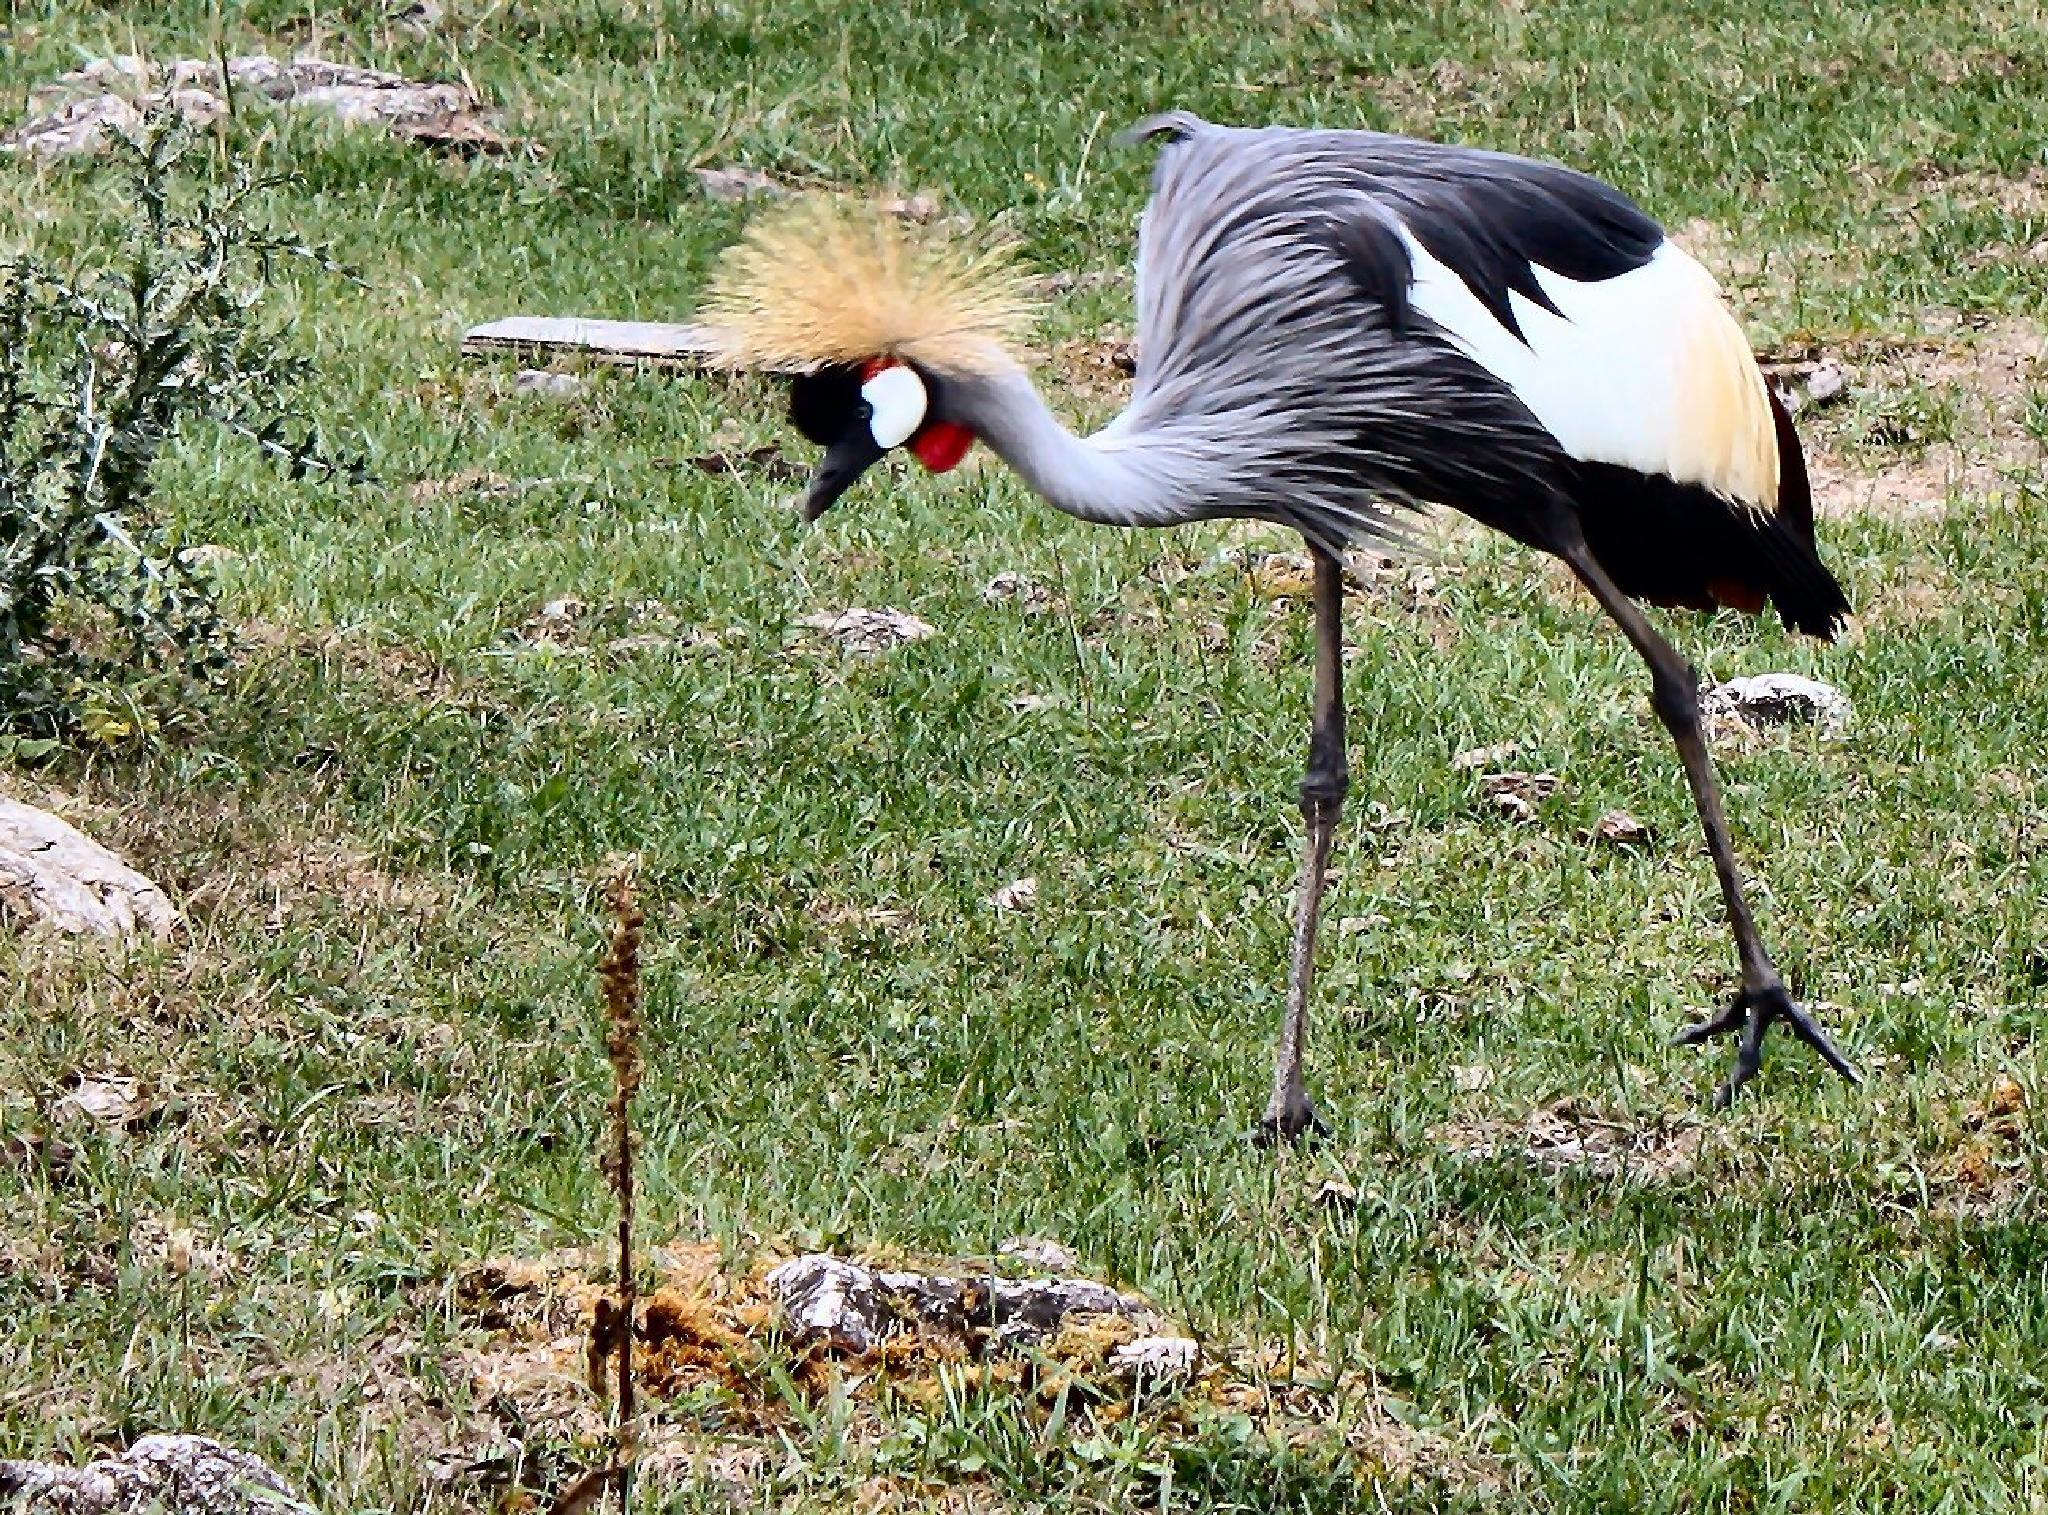 Horned African Crowned Crane by lynettebp